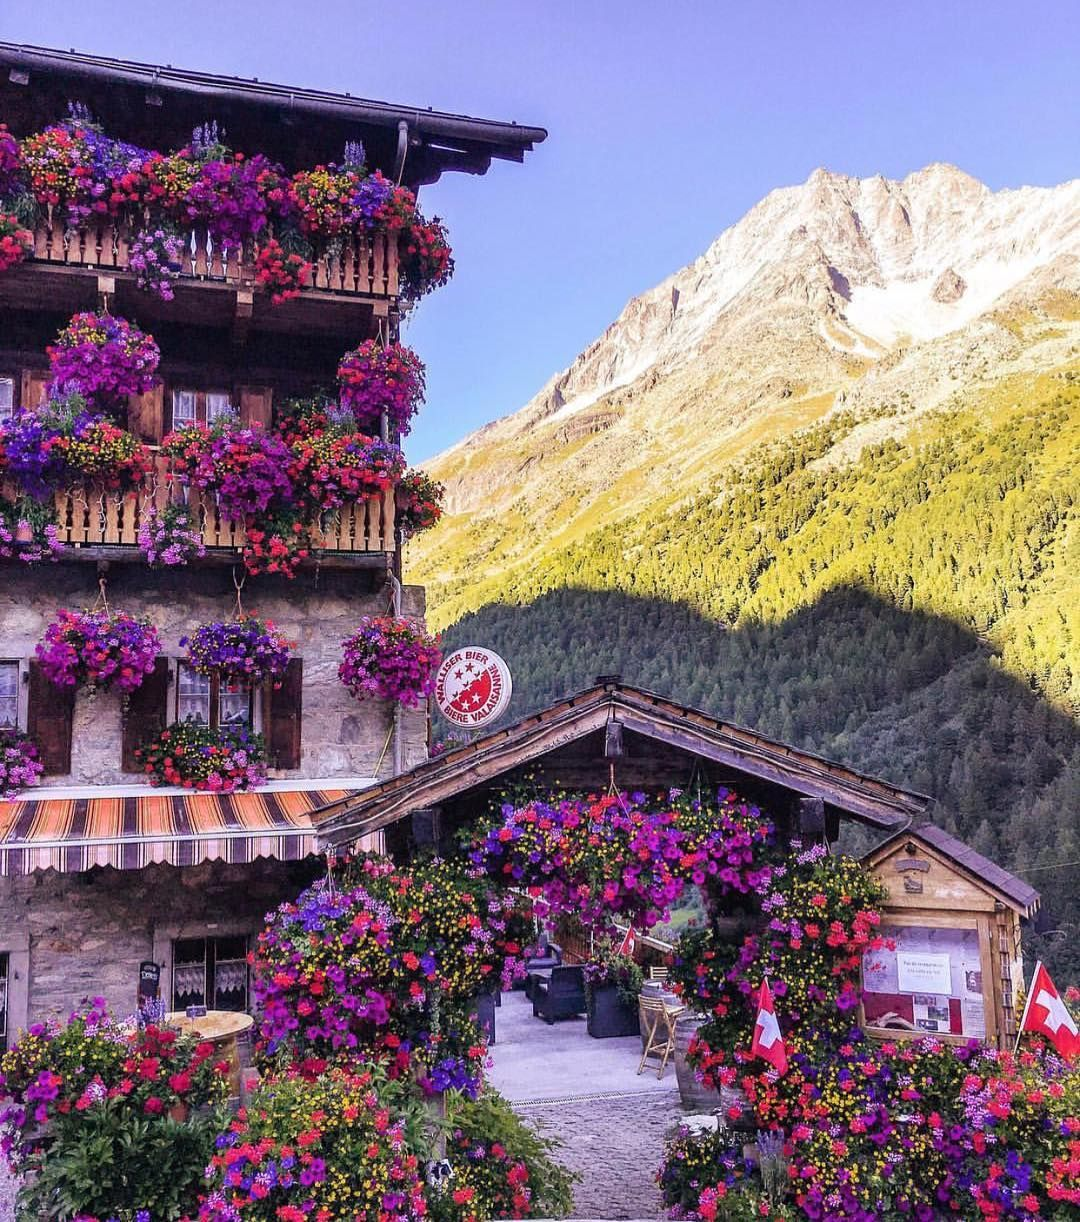 The Glacier Hotel in #Switzerland, shot by @sennarelax ❤️ #travel #luxury #europe #summer ☀️